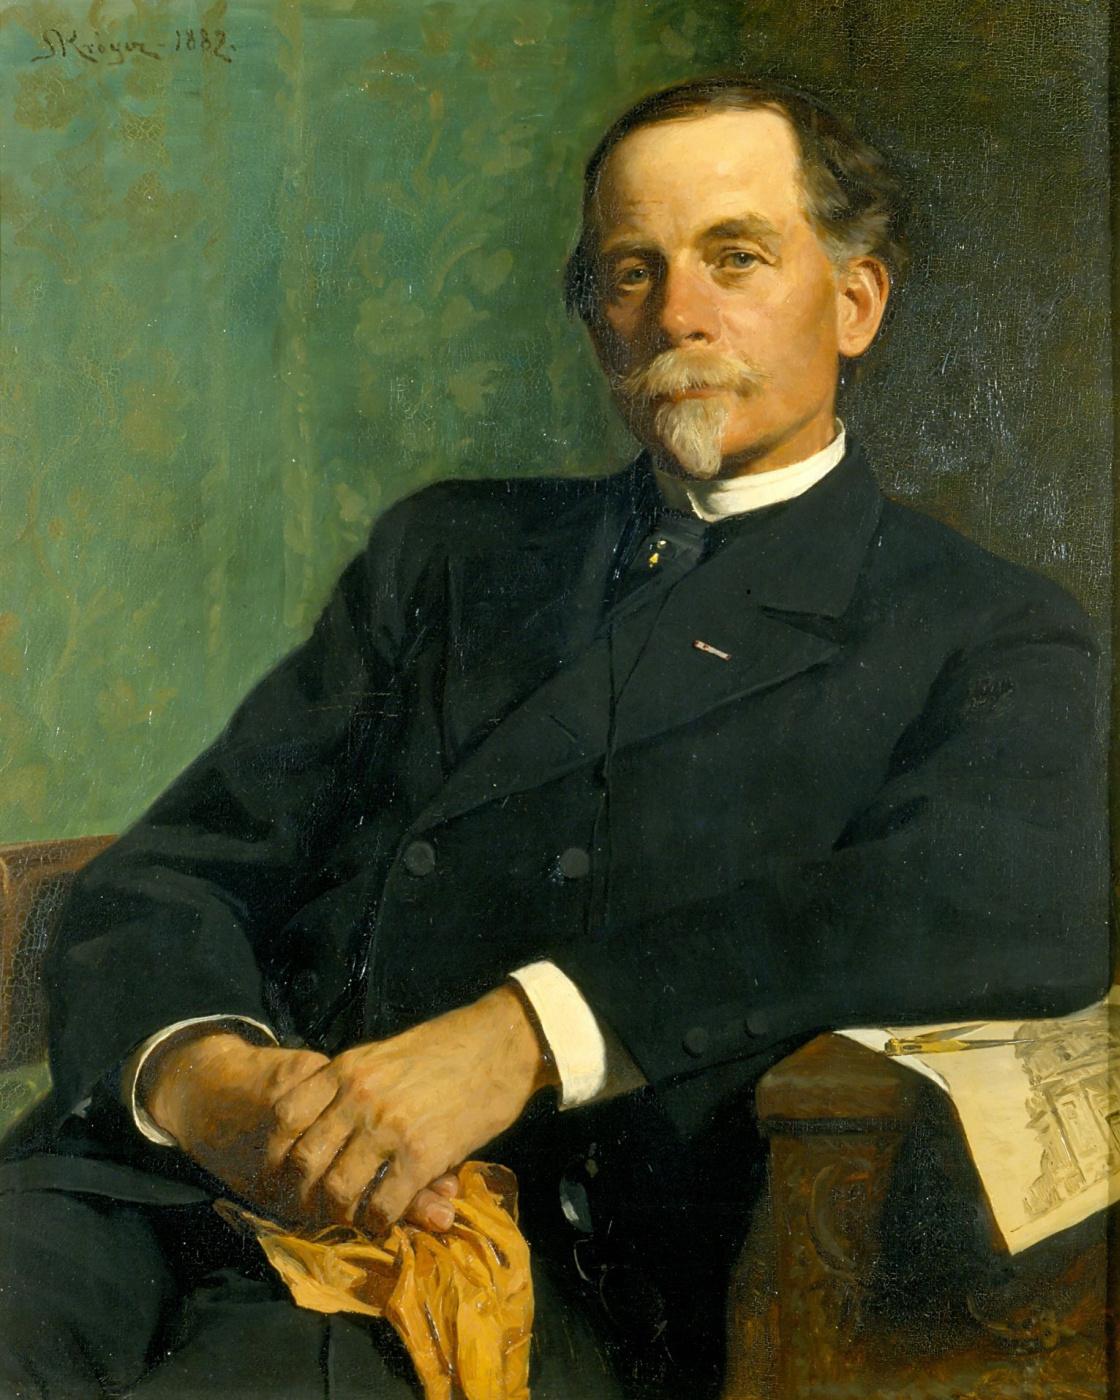 Peder Severin Krøyer. Architect Ferdinand Meldahl